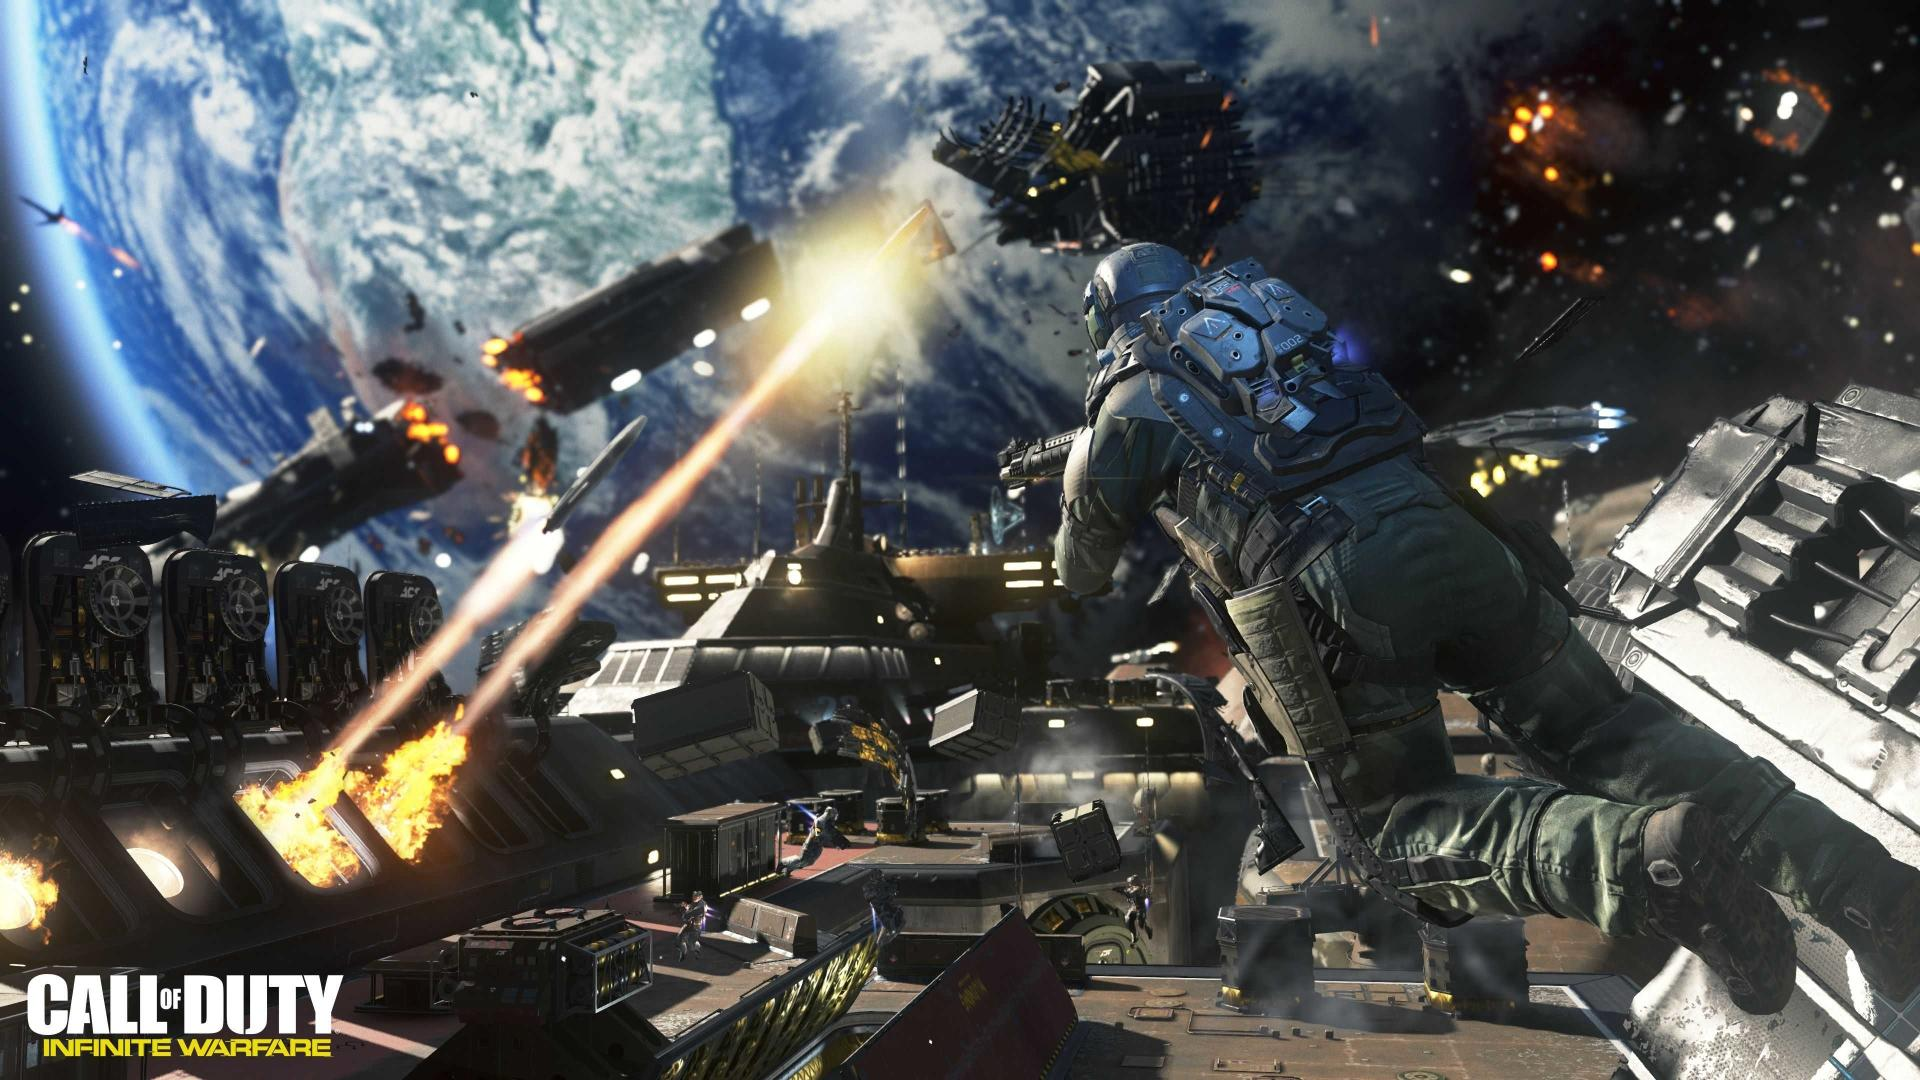 Cod Infinite Warfare Wallpaper: Call Of Duty Infinite Warfare Wallpaper HD Download